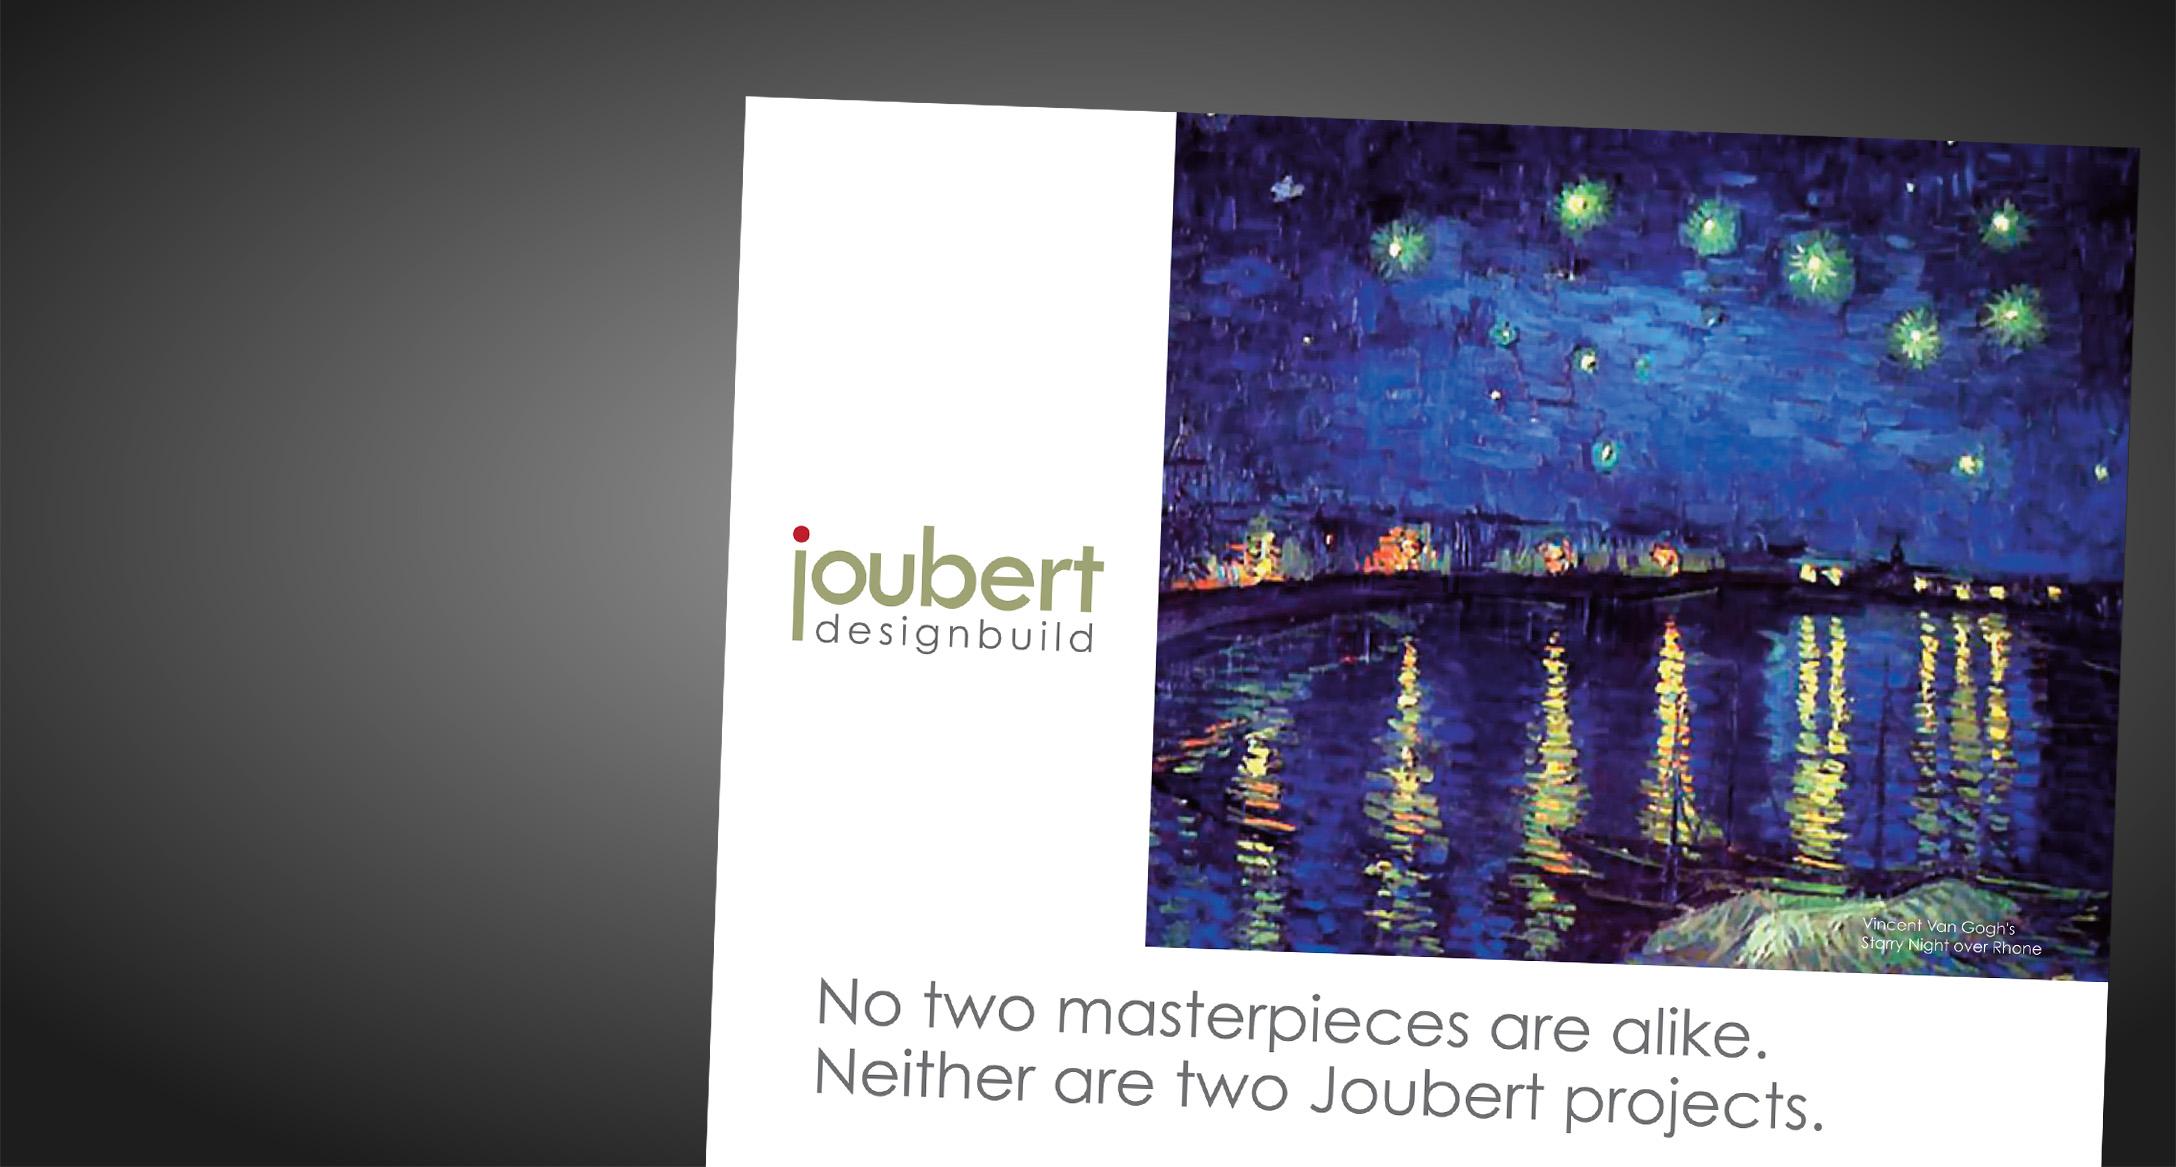 Icond Design Build Joubert